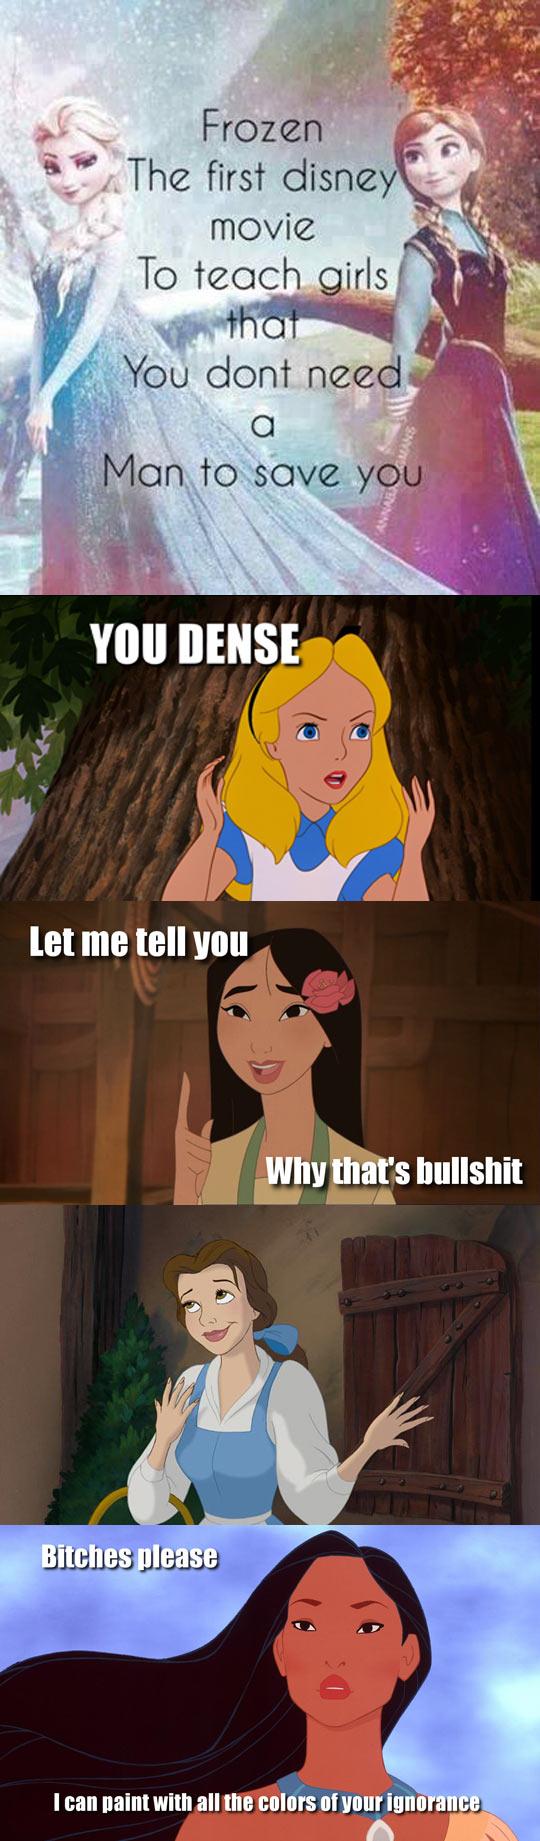 funny-Frozen-Disney-feminism-hidden